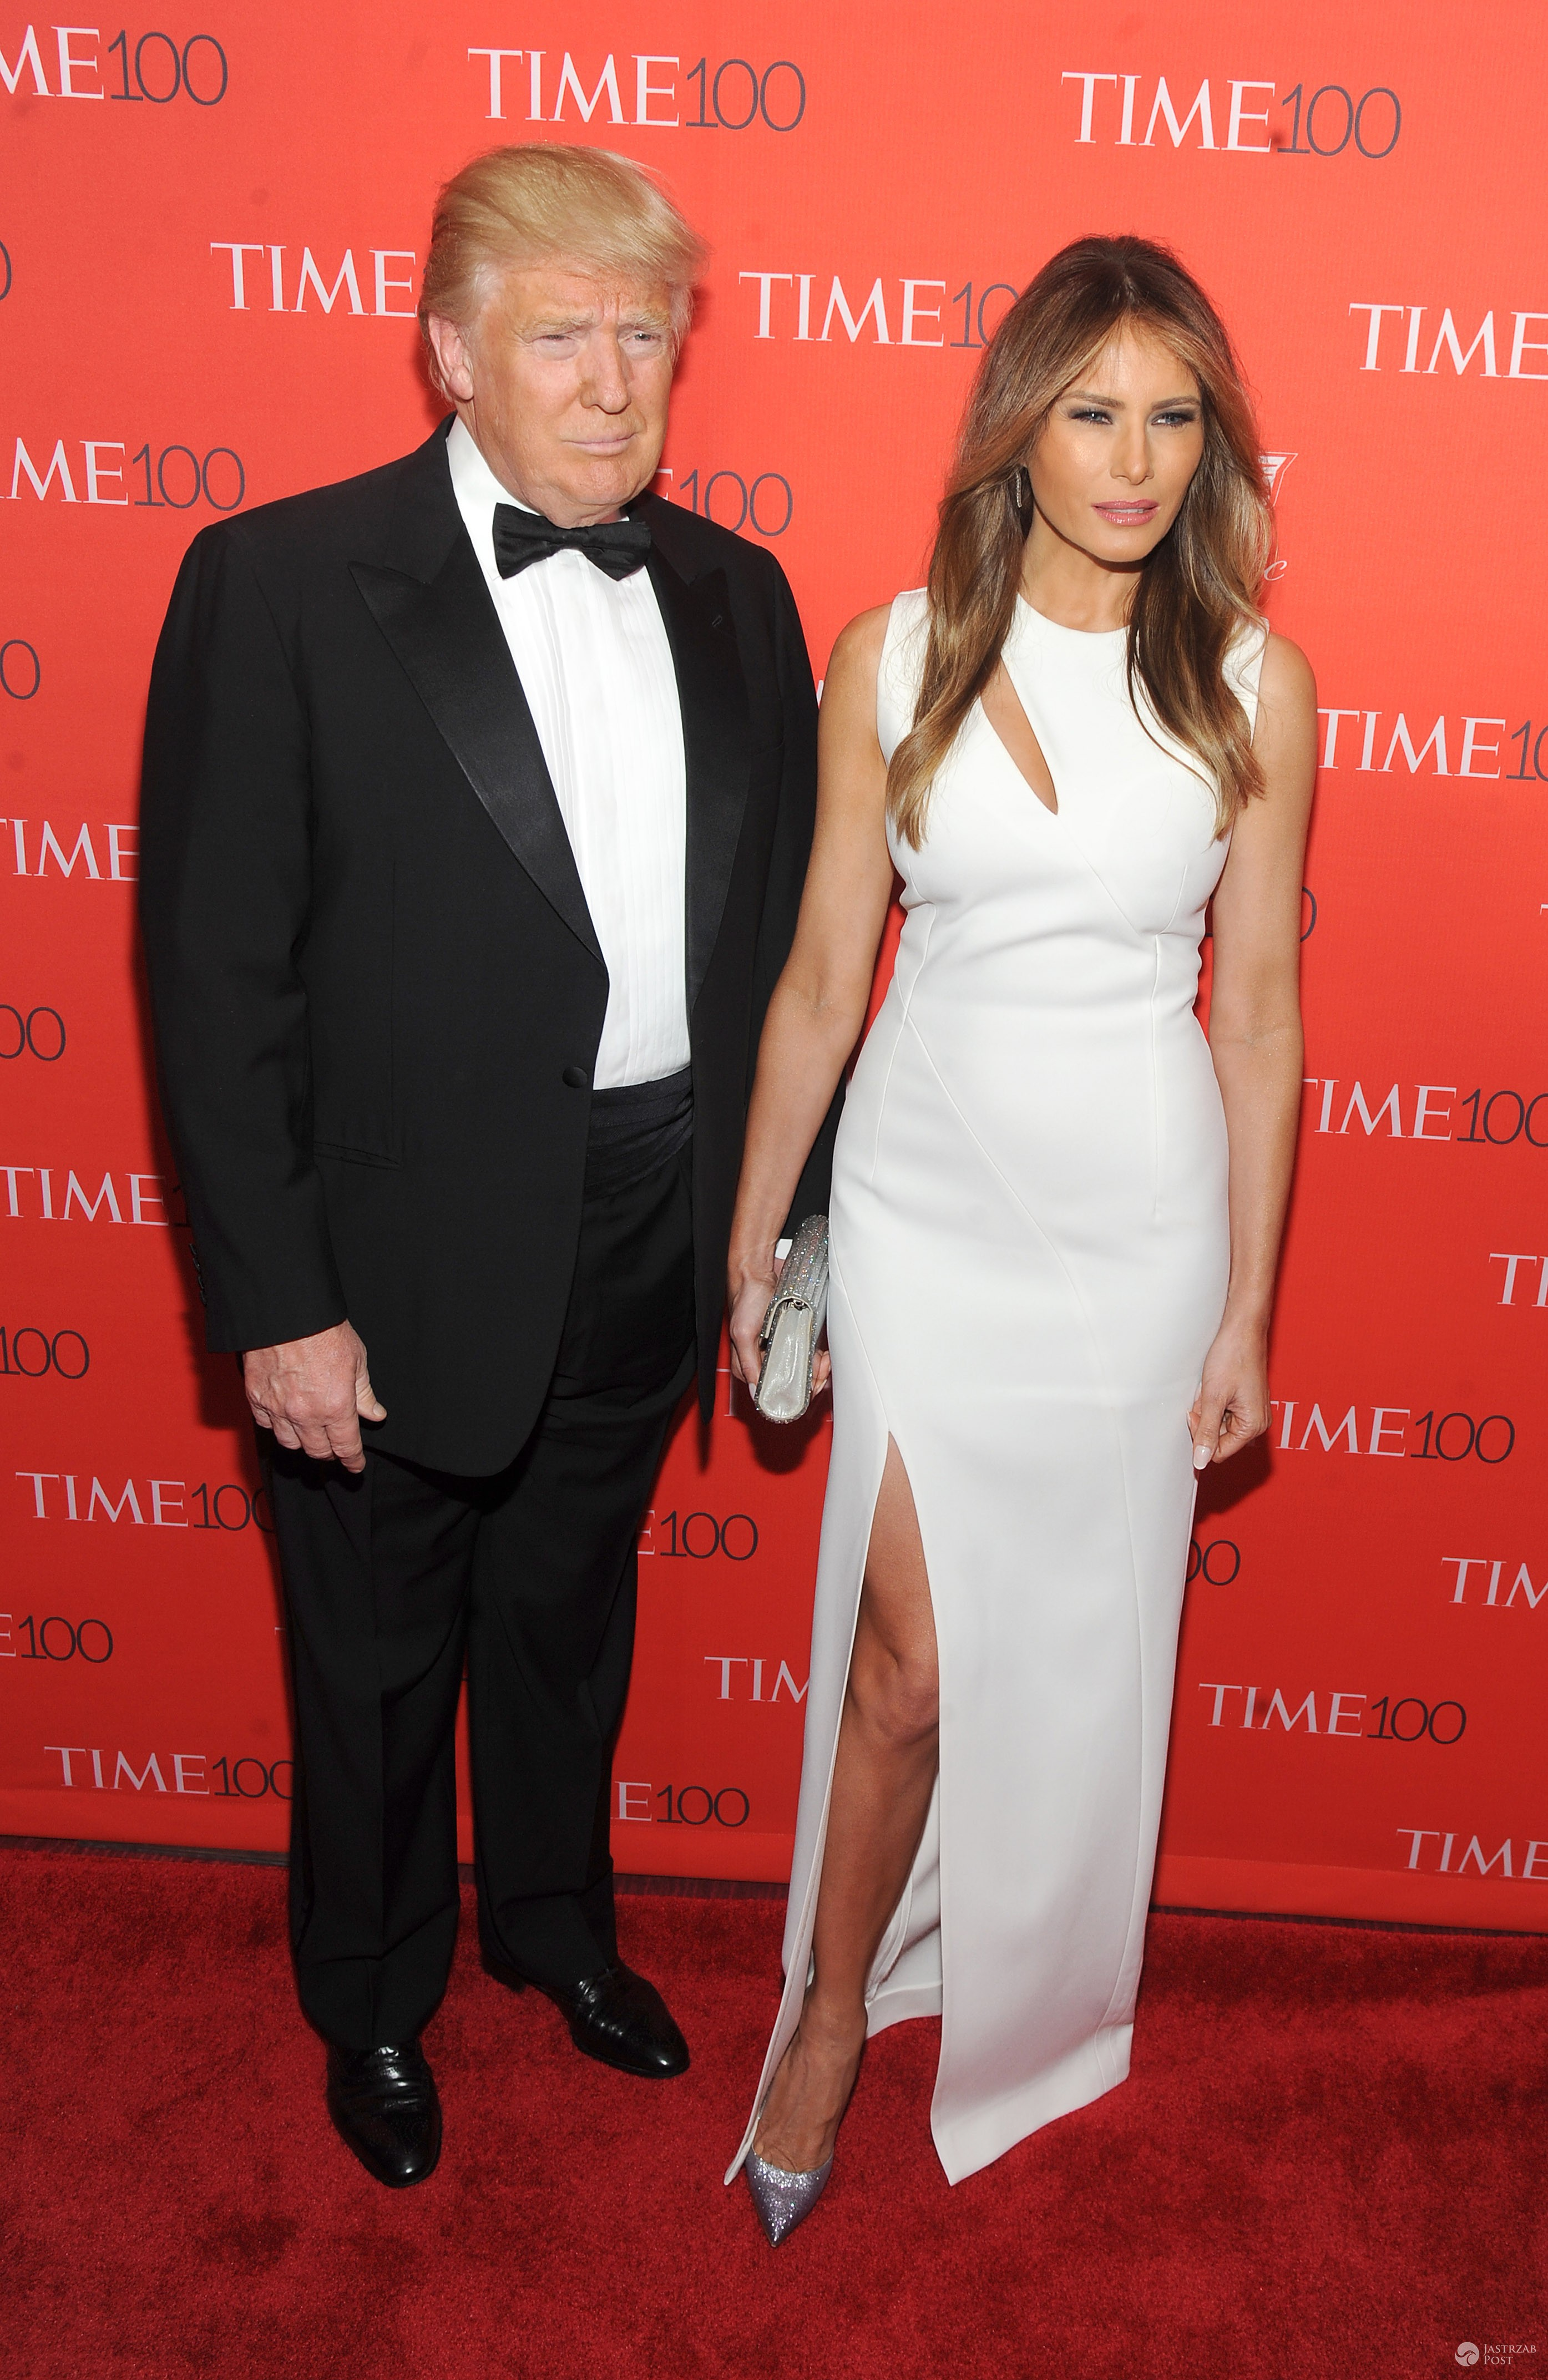 Donald Trump (kandydat Republikanów na fotel prezydenta USA) z żoną Melanią Trump (fot. ONS)